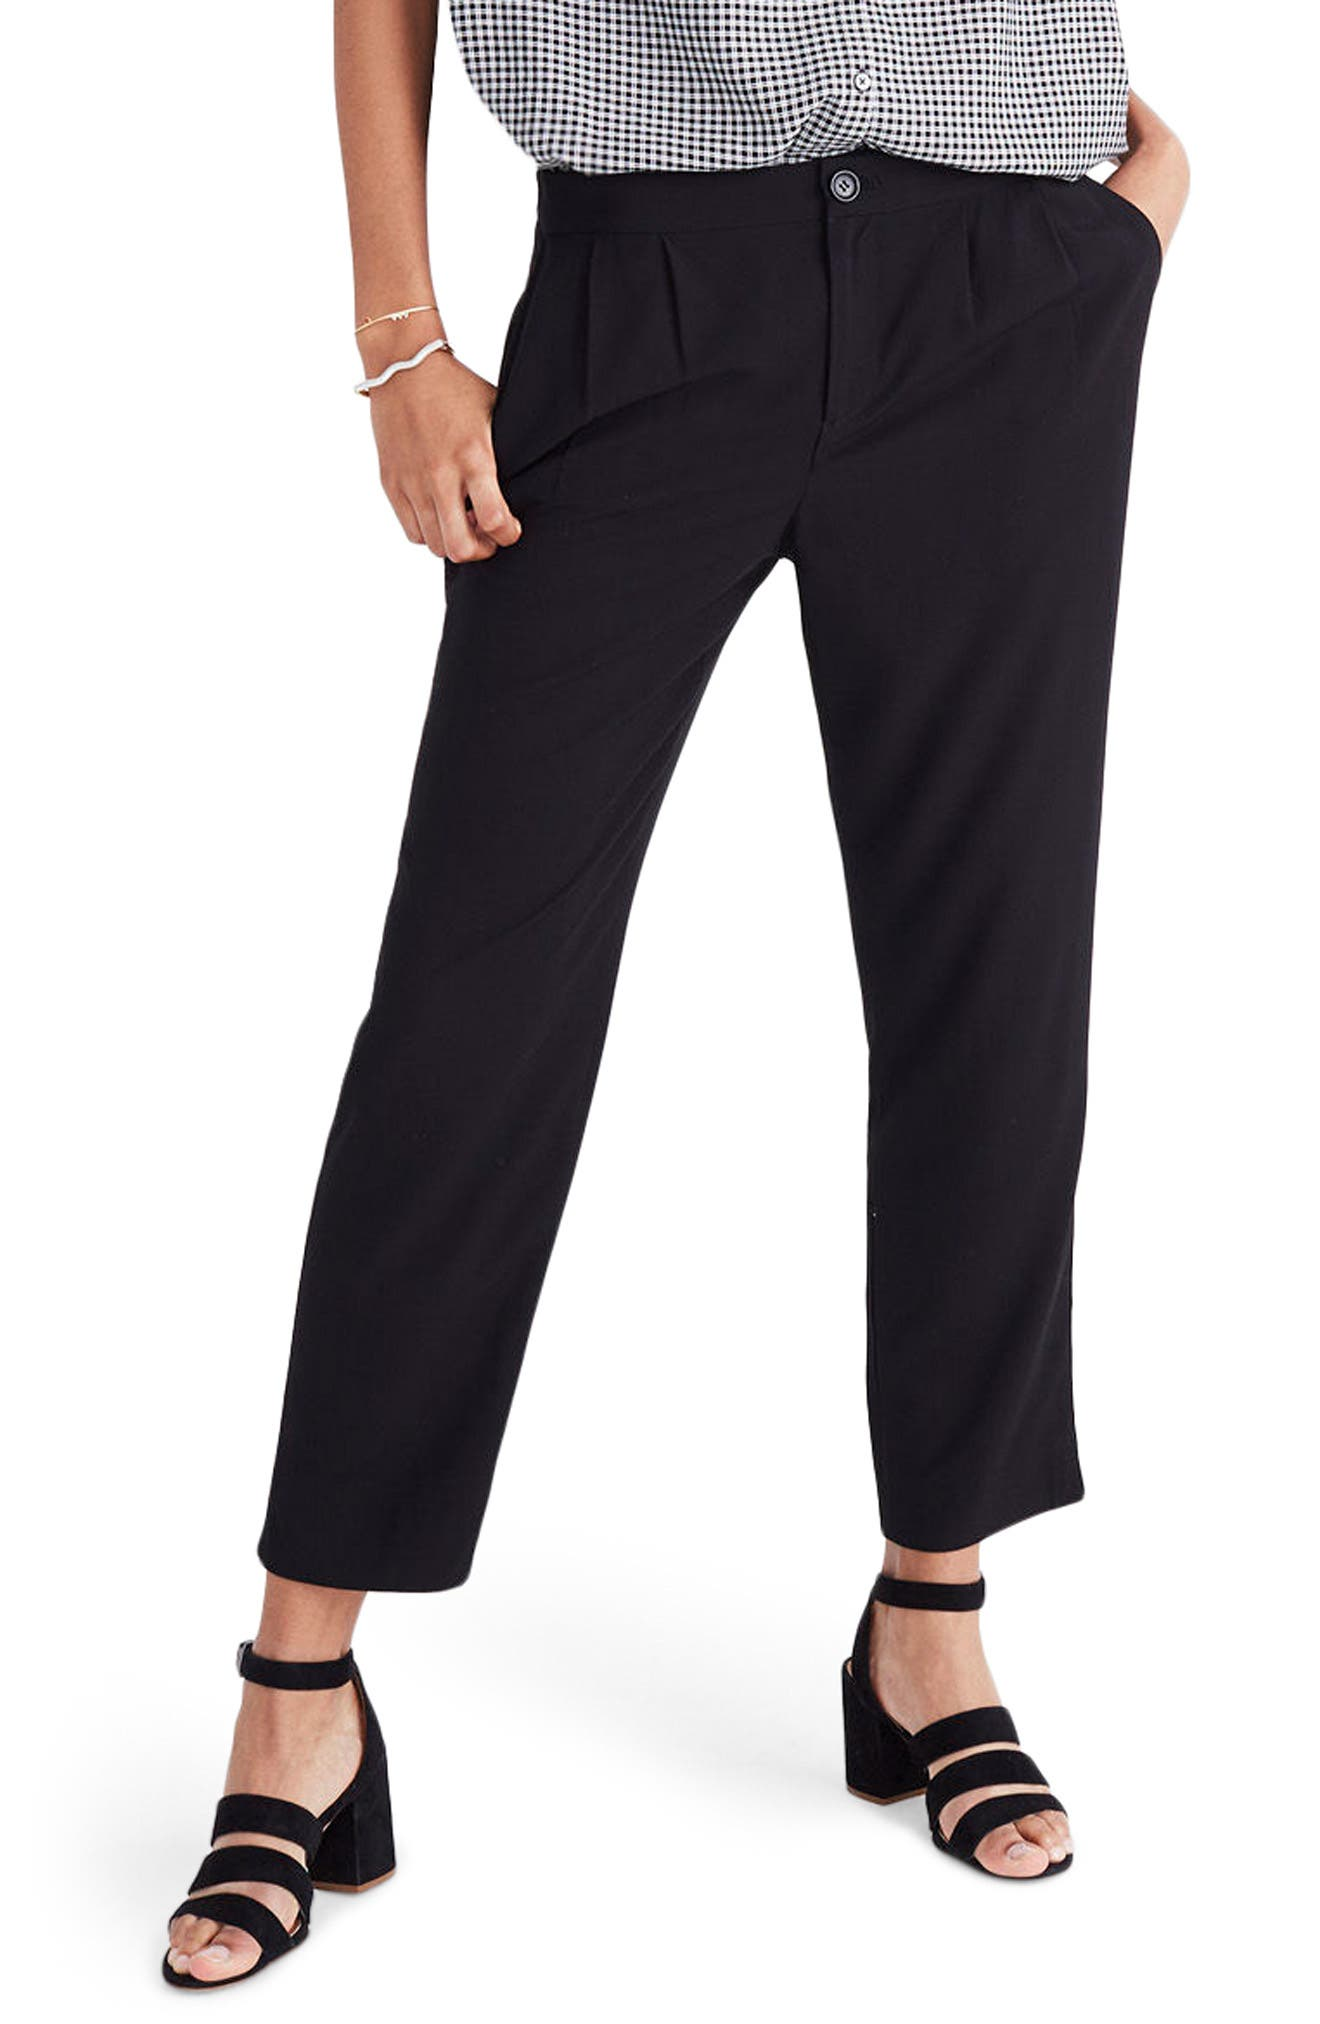 Madewell High Waist Crop Track Trousers